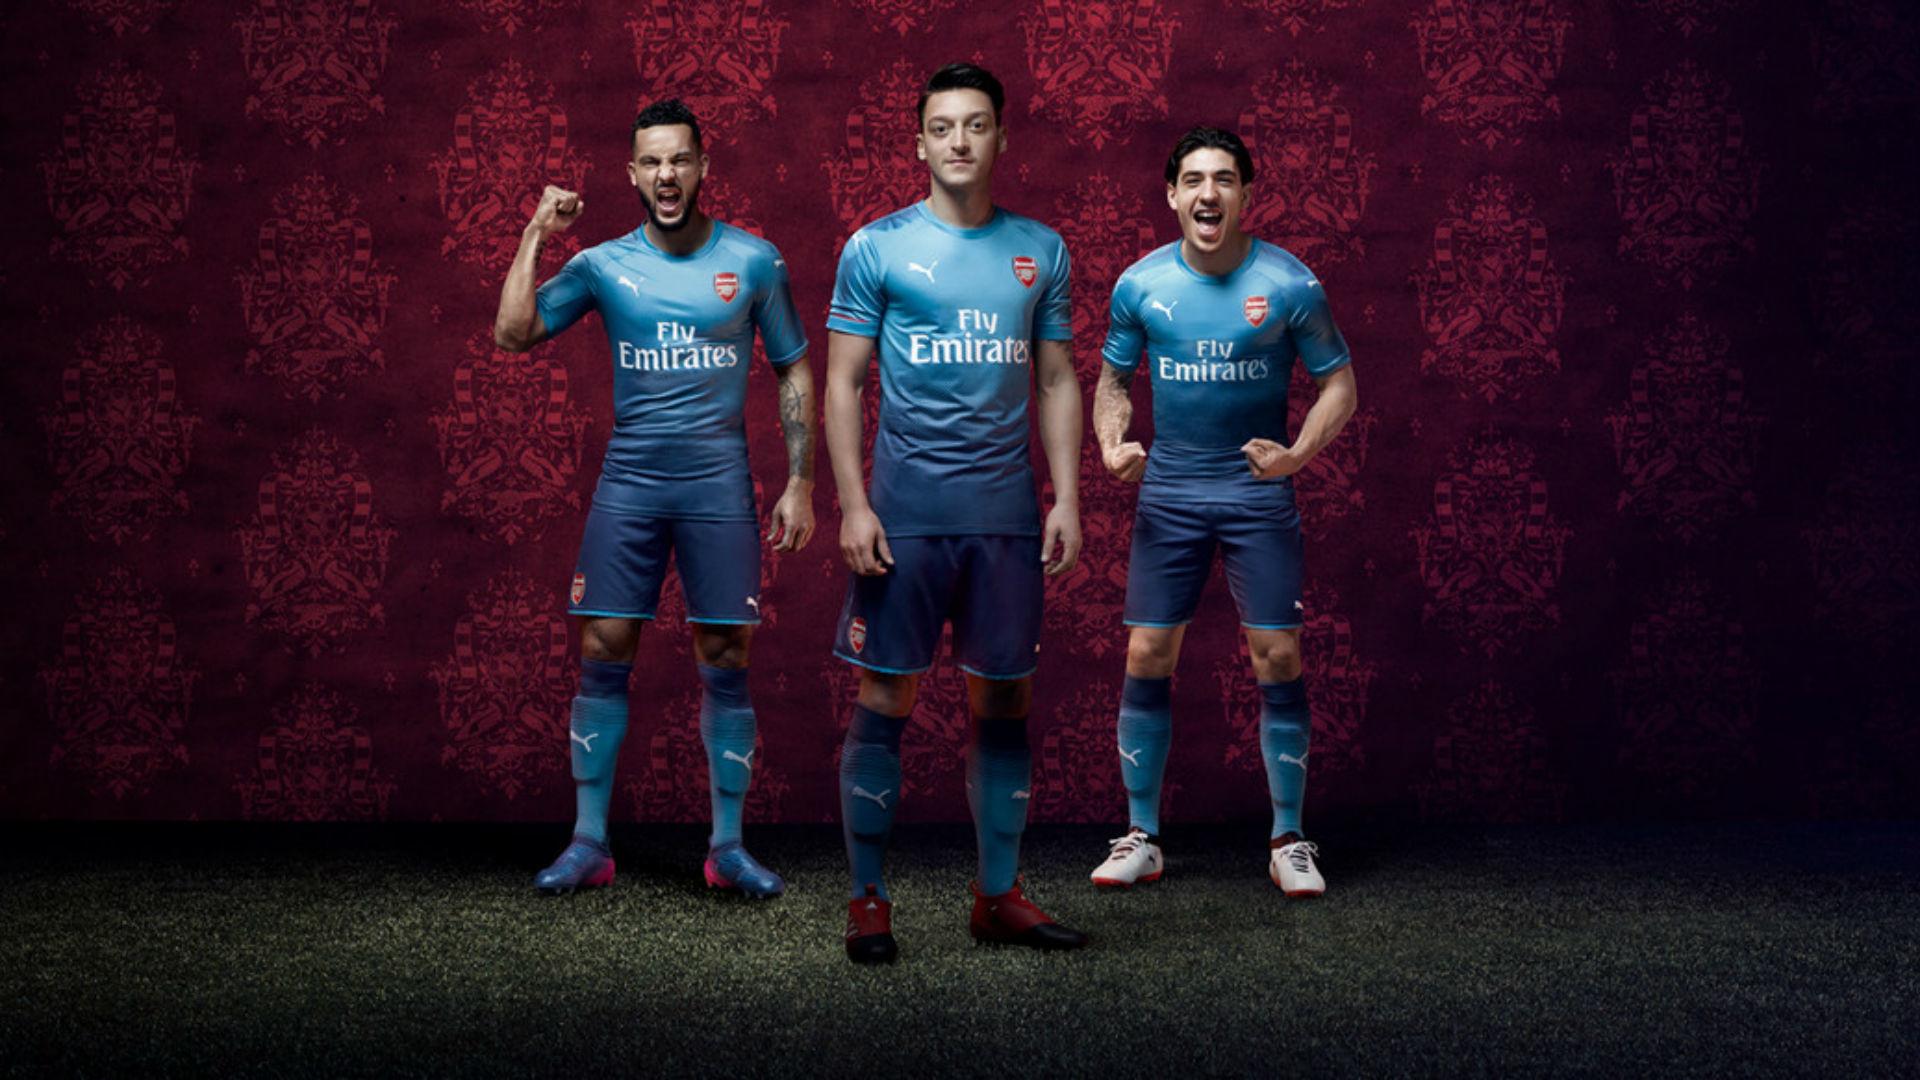 Man Utd Wallpapers 2018 (68+ Images